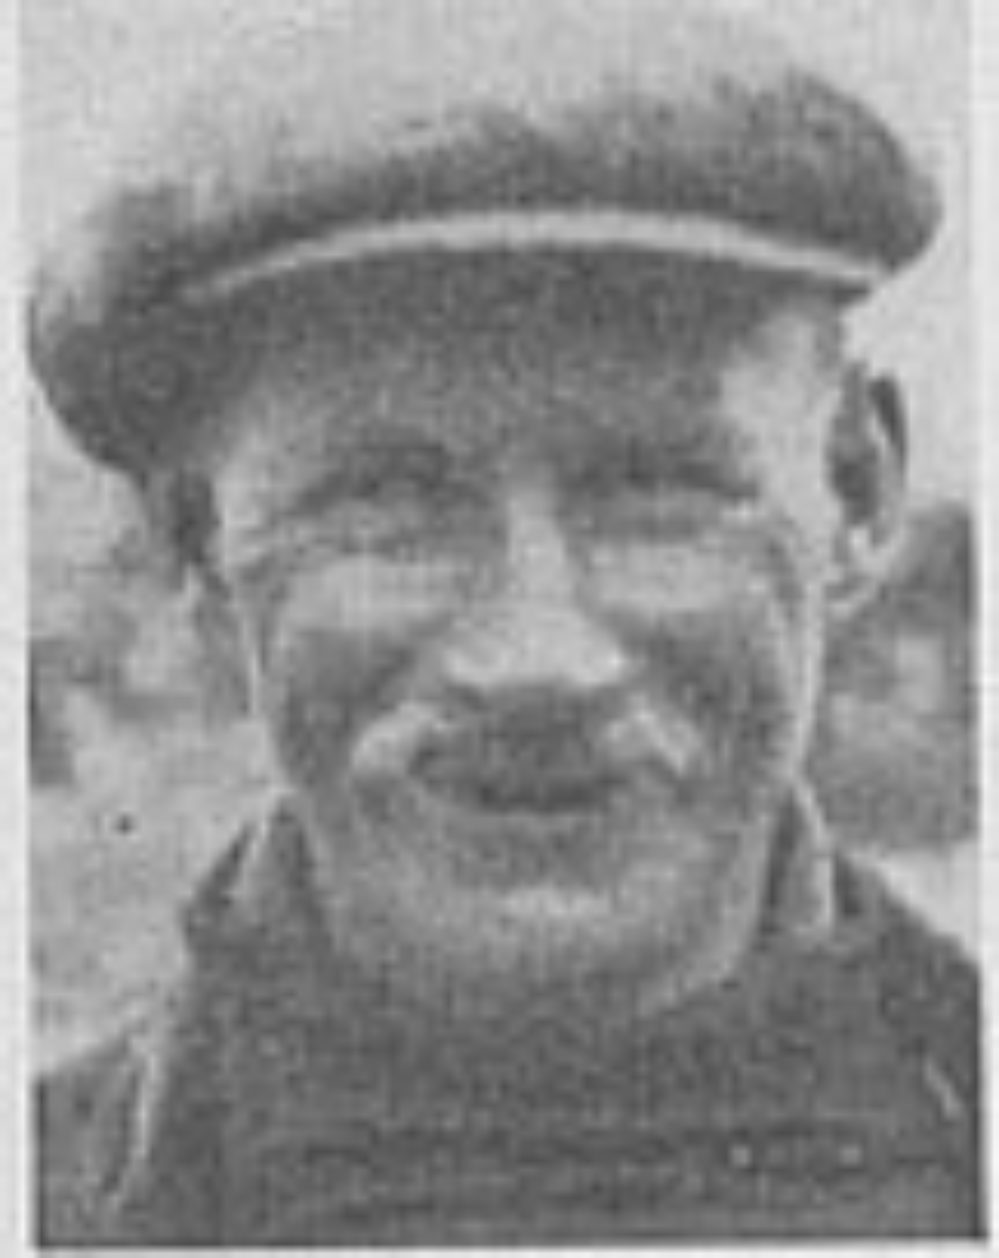 August Emelius Johan Jakobsen